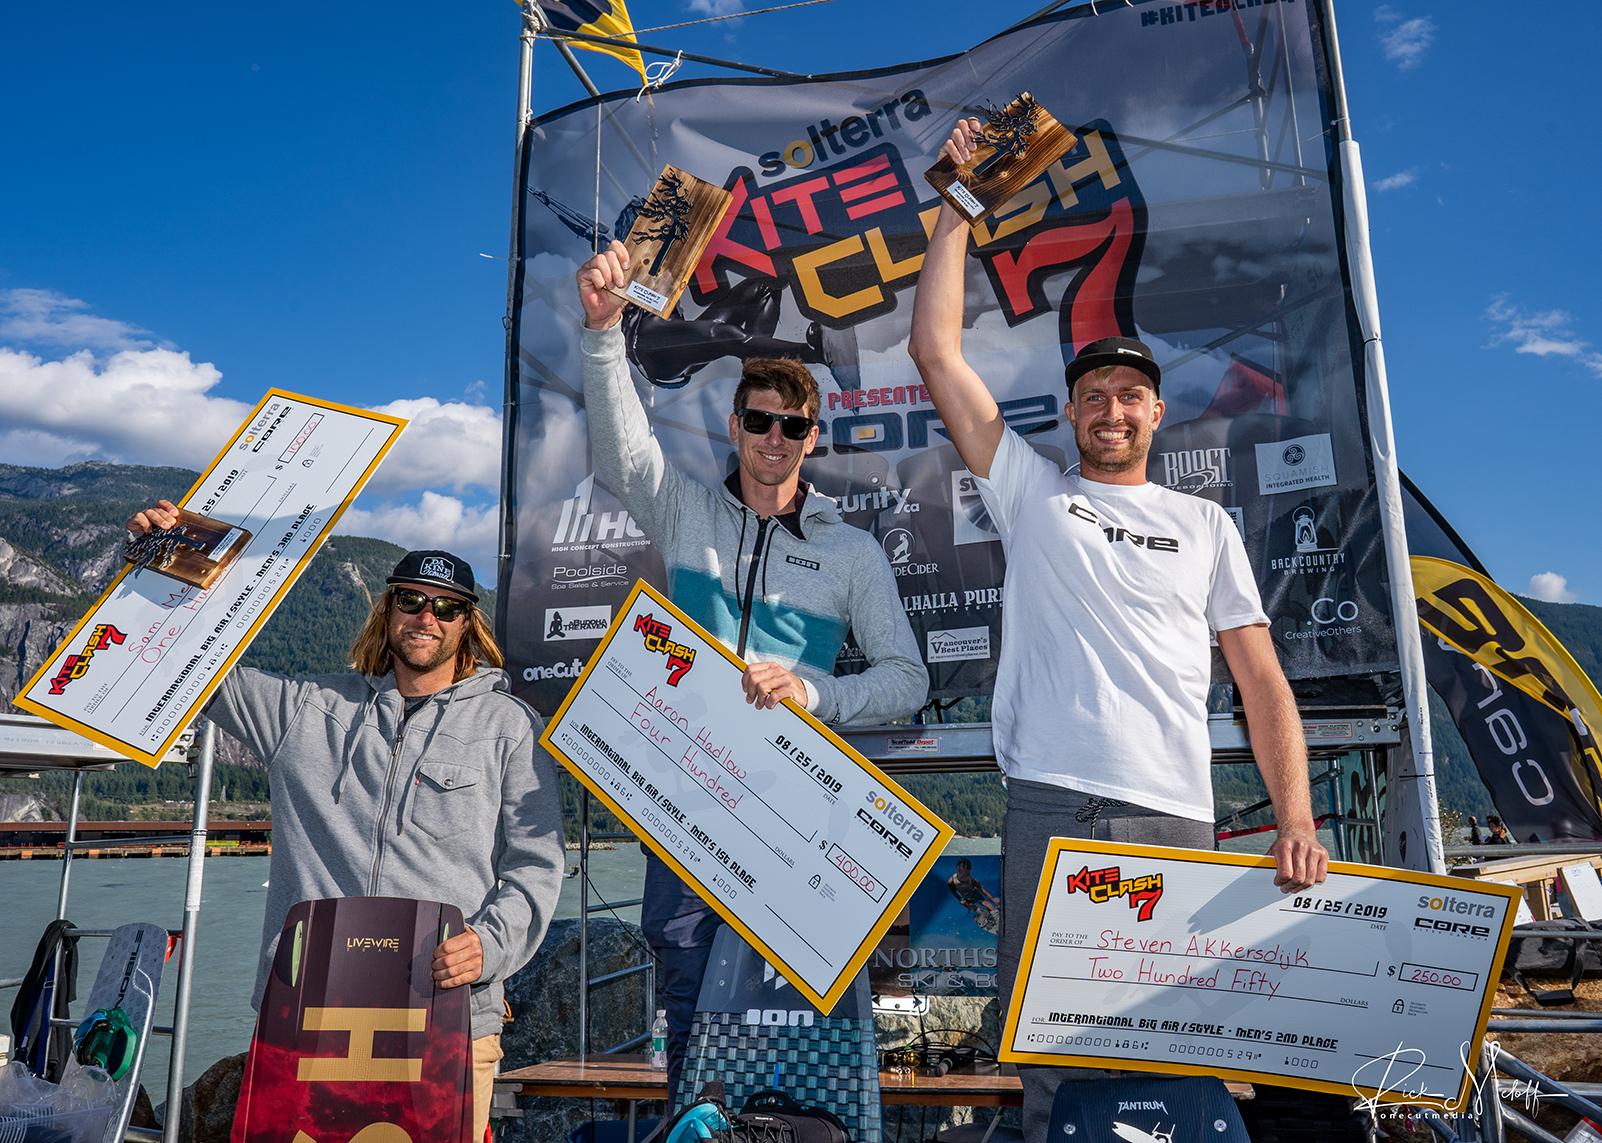 Men's Big Air-Style Podium - Kite Clash 7 (2019) - Photo by Rick Meloff